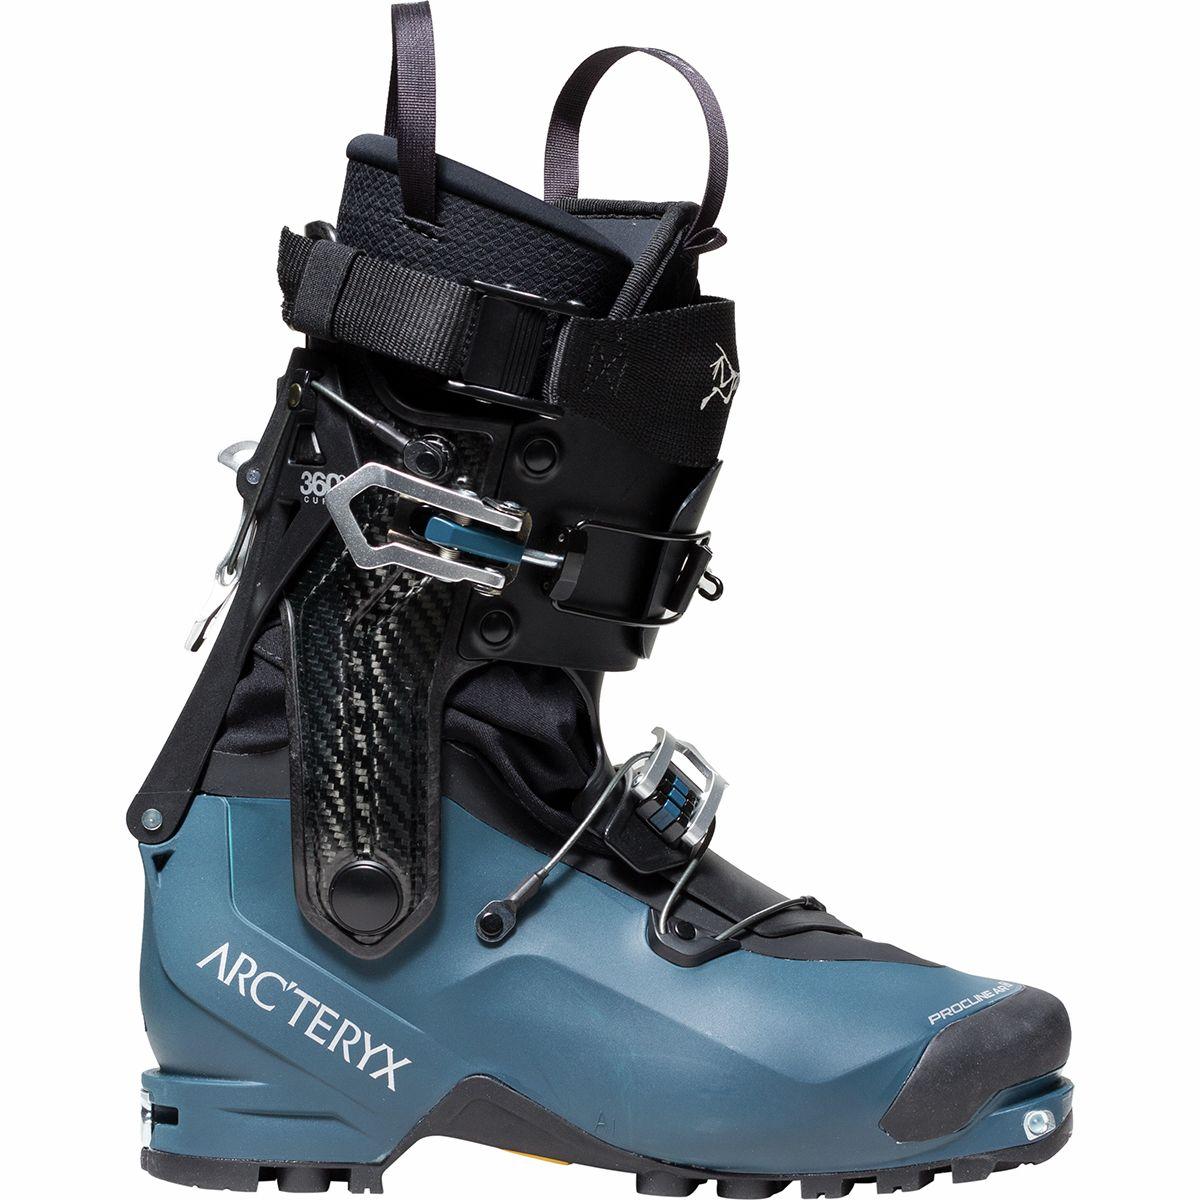 photo: Arc'teryx Procline AR Carbon alpine touring boot